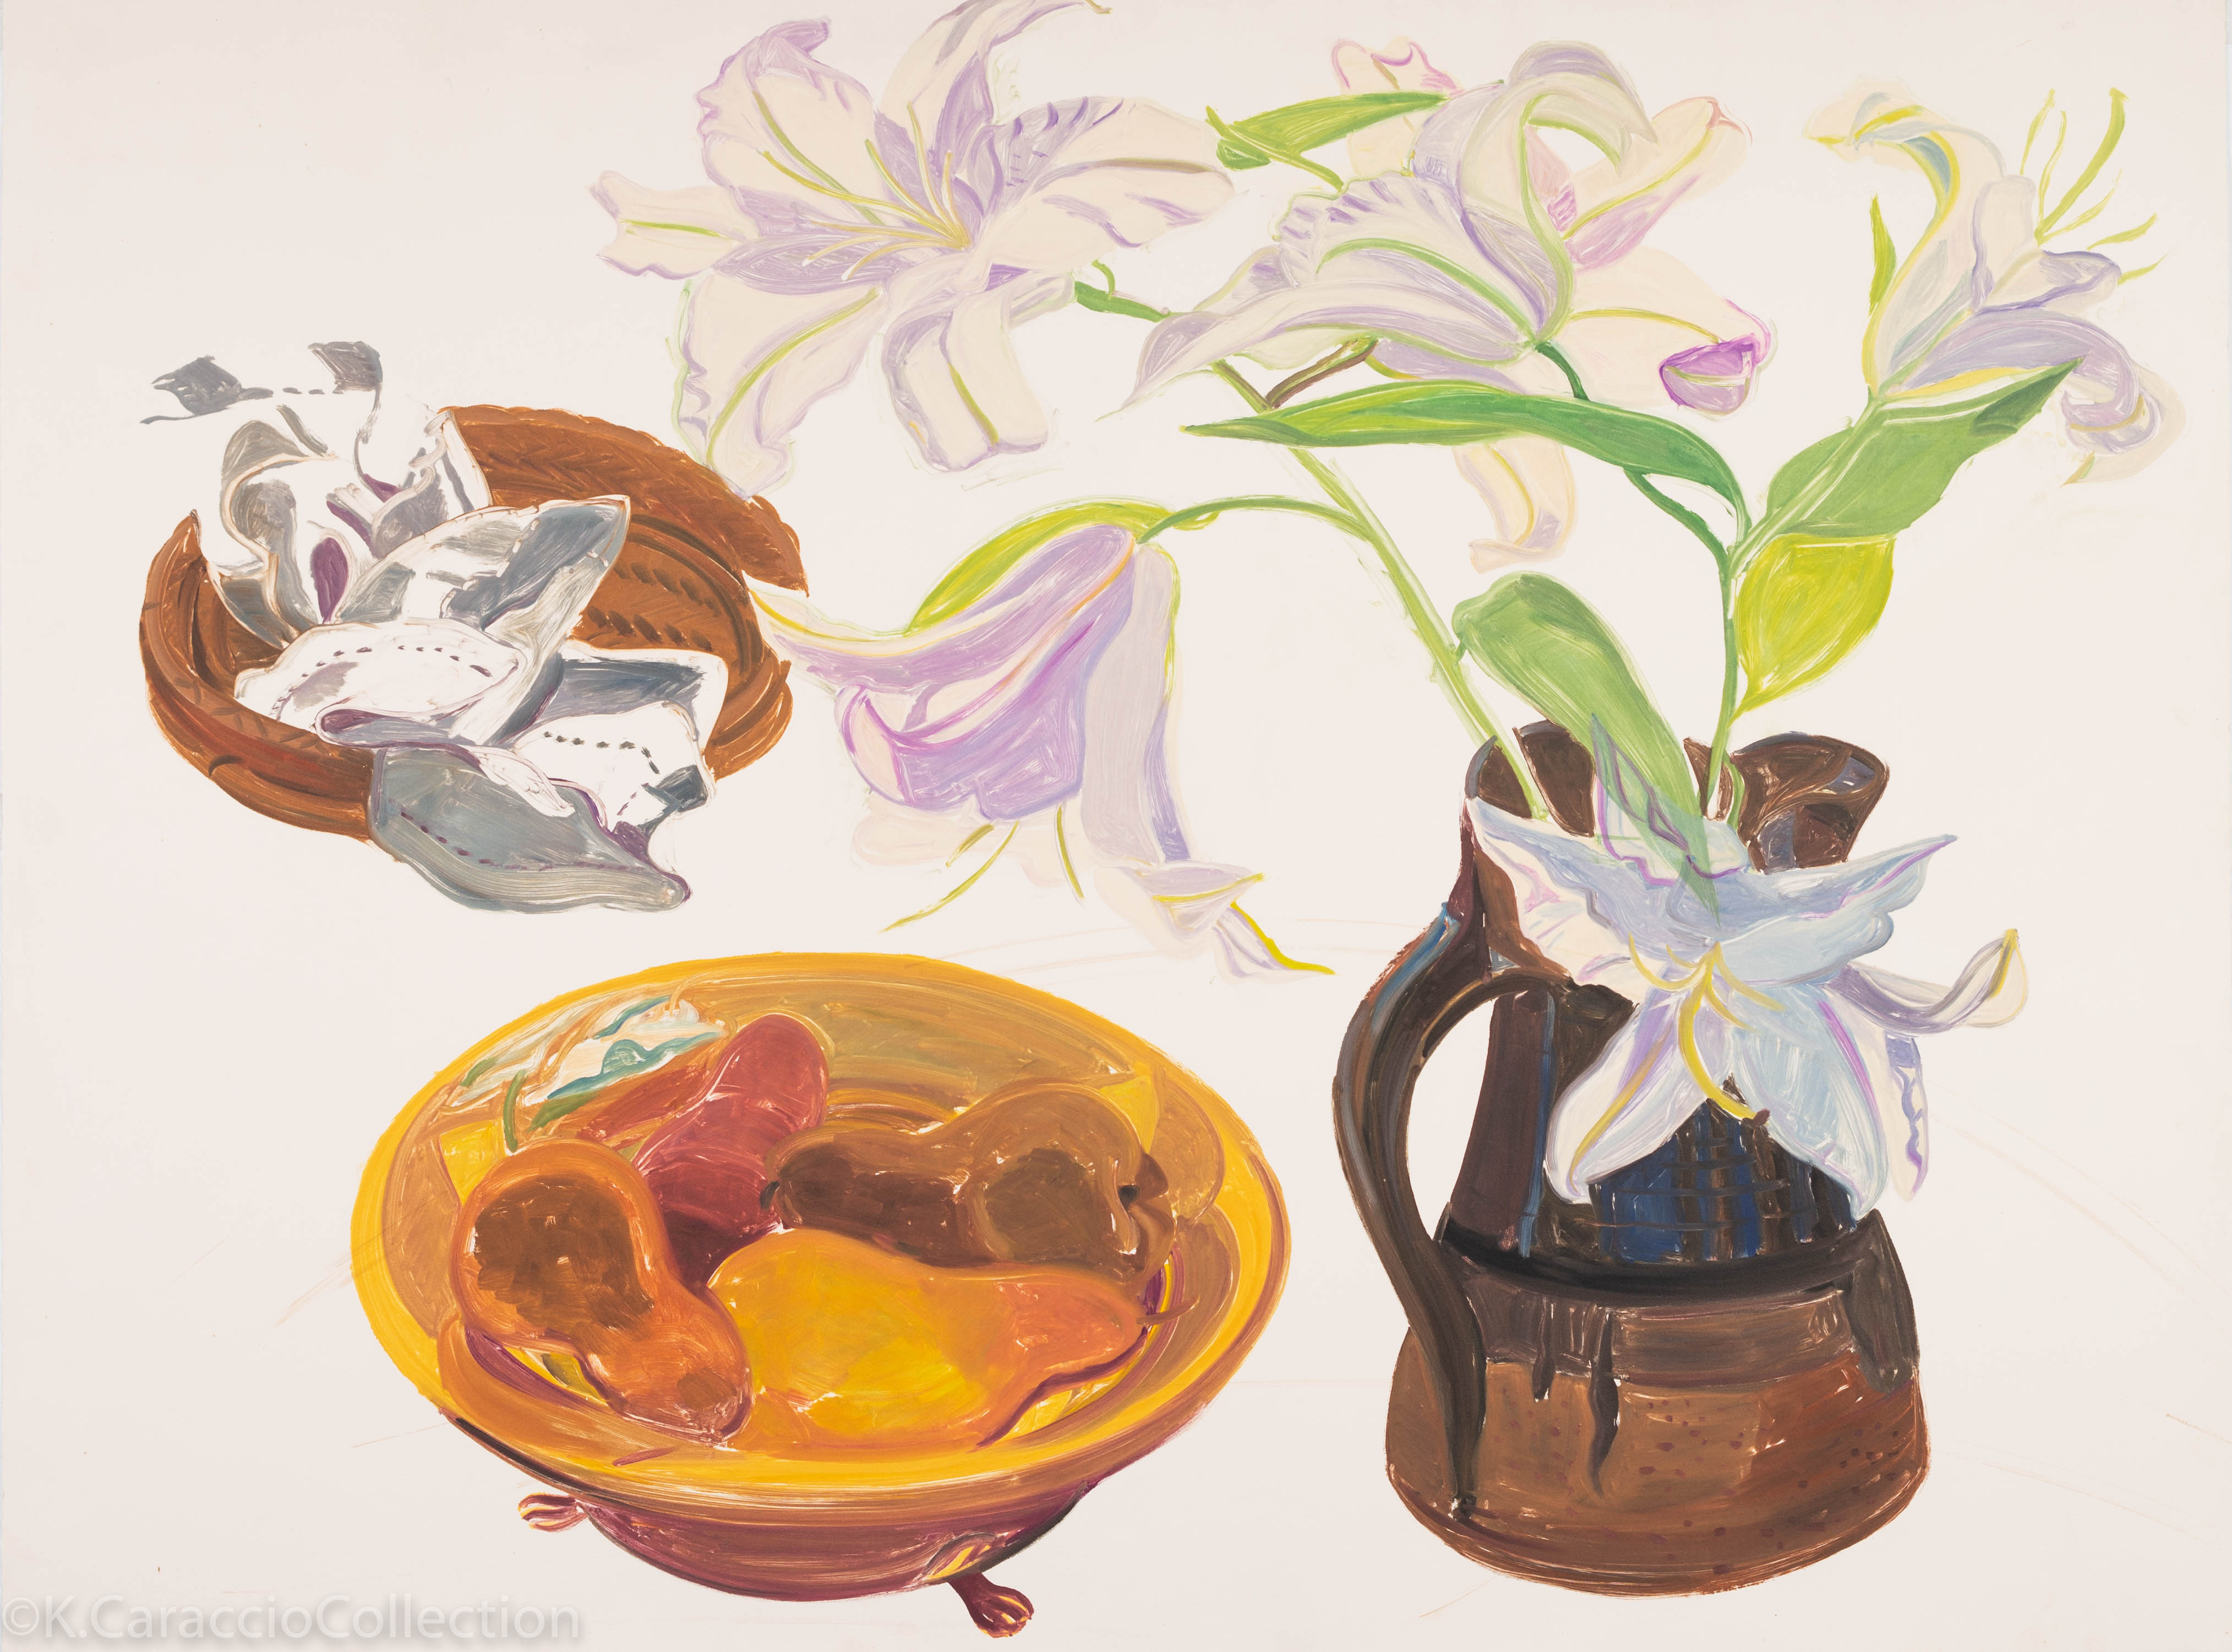 Shorr, Harriet_Casablanca Lilies (unsign